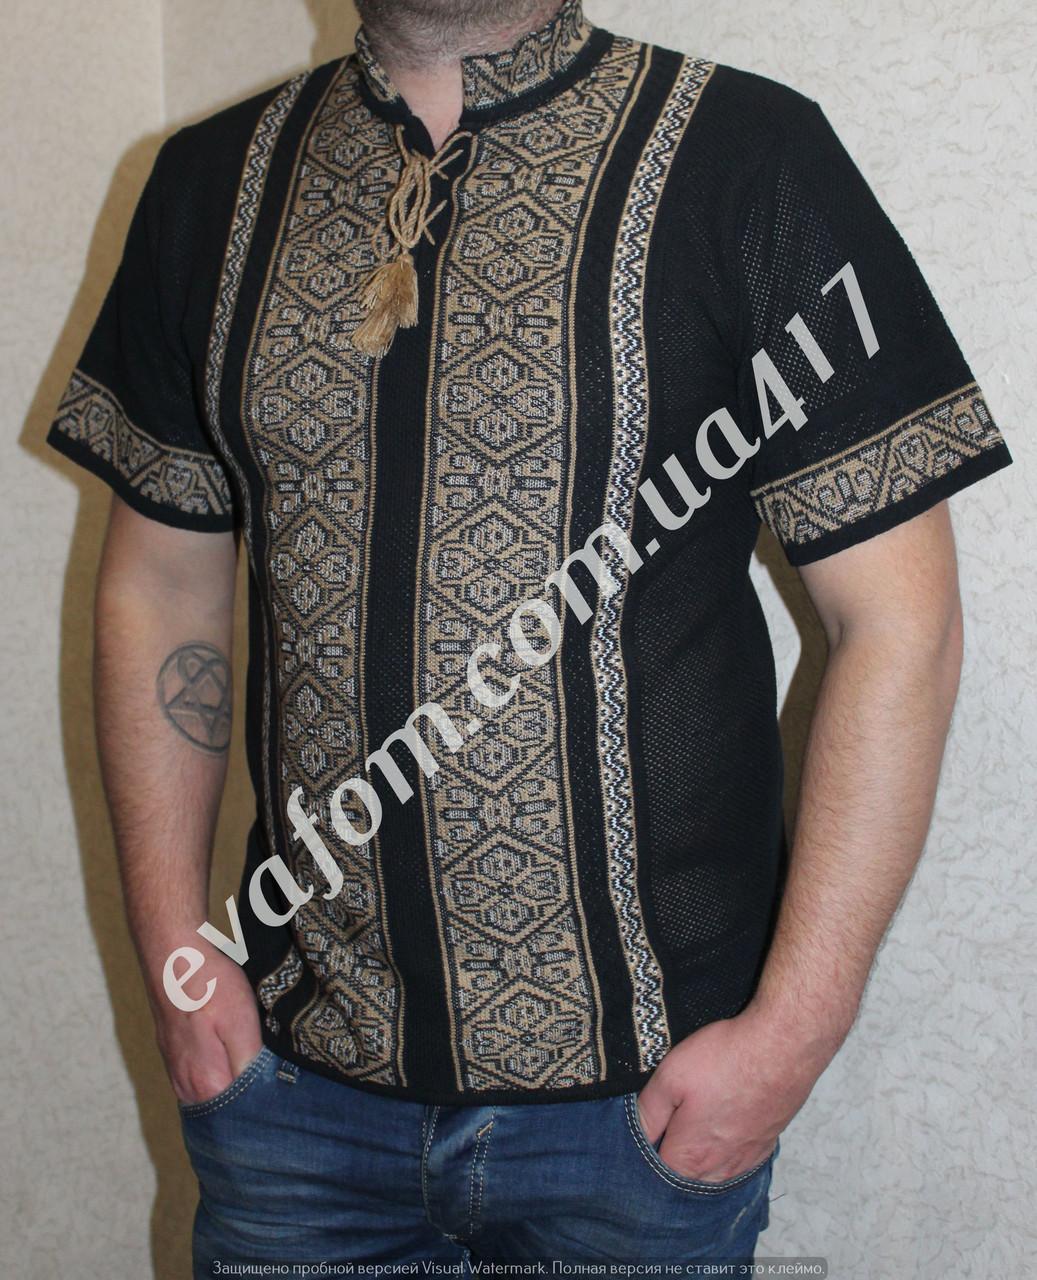 389b73155445 Вишиванка мужская, цена 370 грн., купить Хмельницький — Prom.ua (ID ...